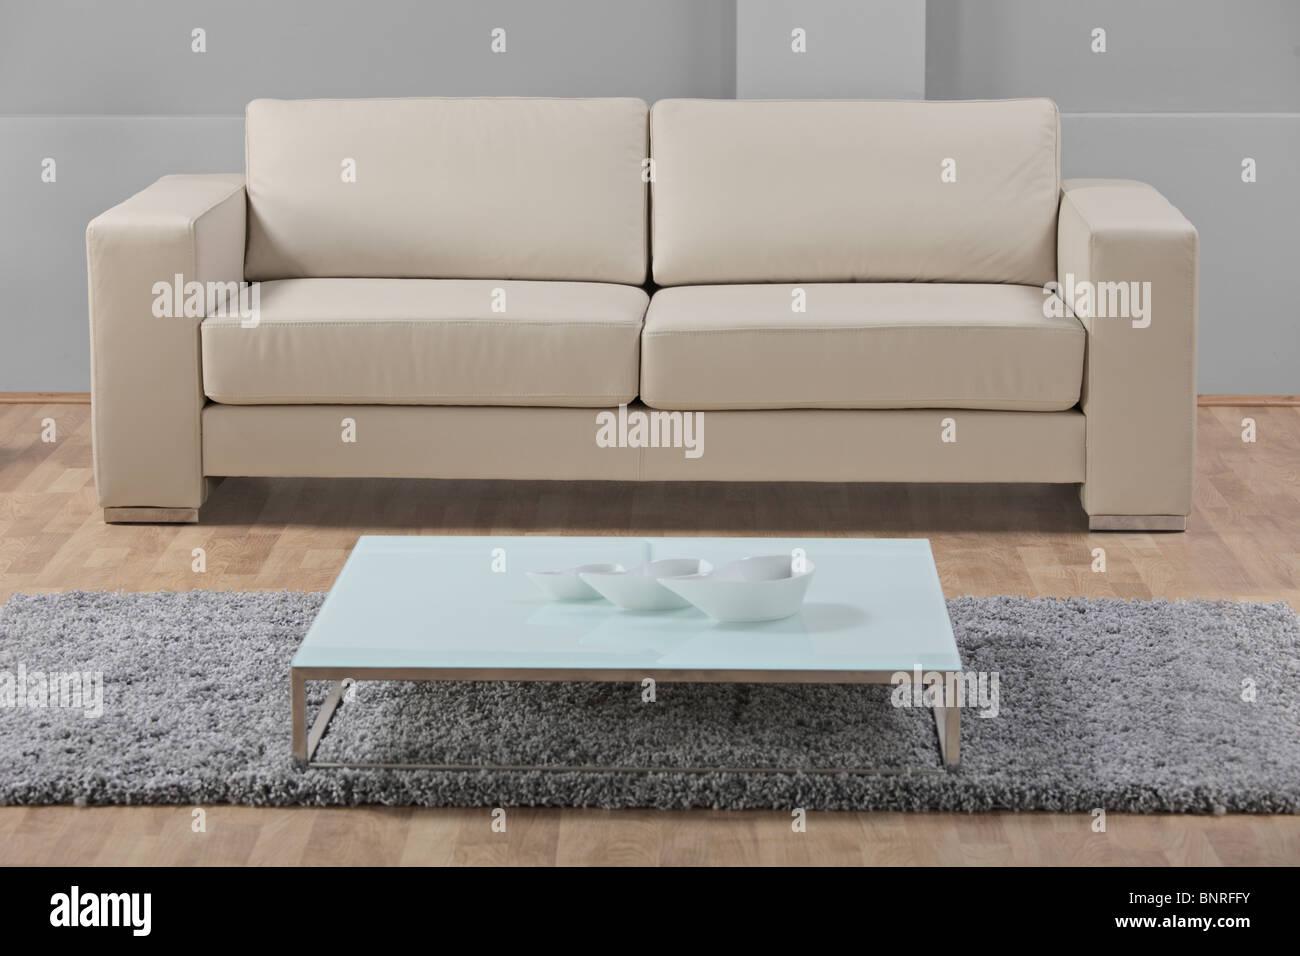 sofa stockfotos sofa bilder alamy. Black Bedroom Furniture Sets. Home Design Ideas